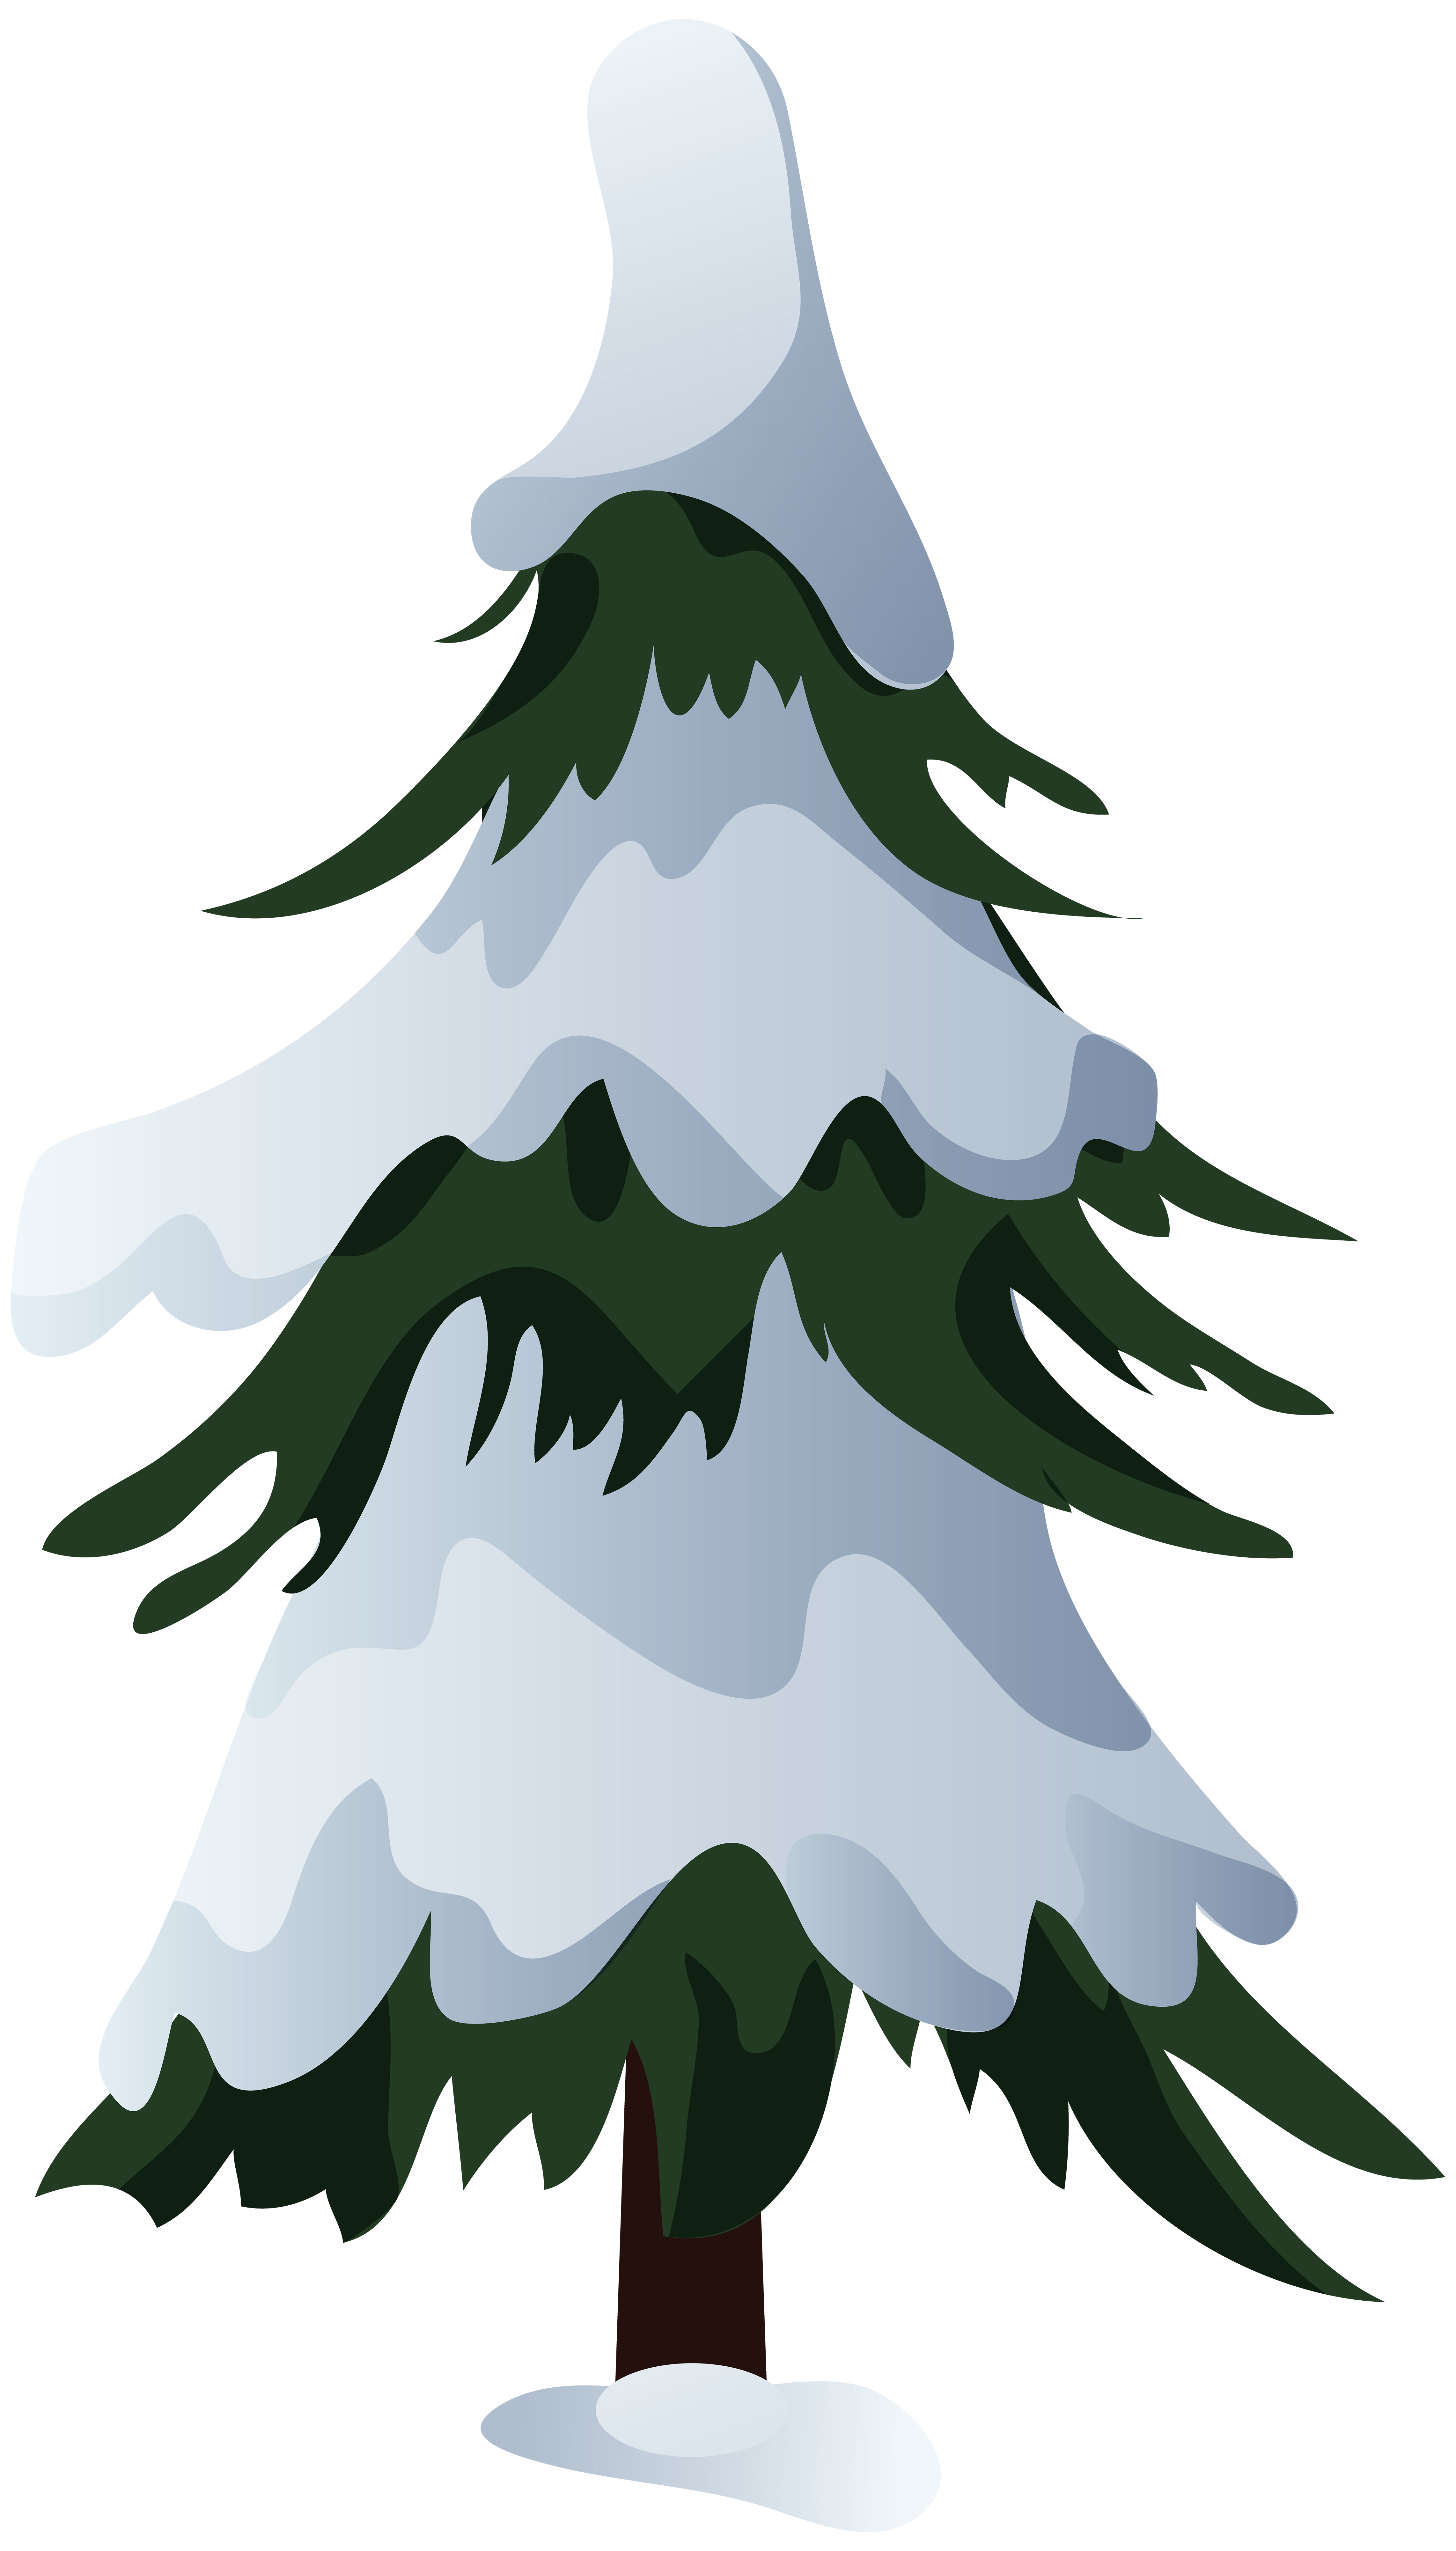 Tree clipart snow. Christmas pine transprent